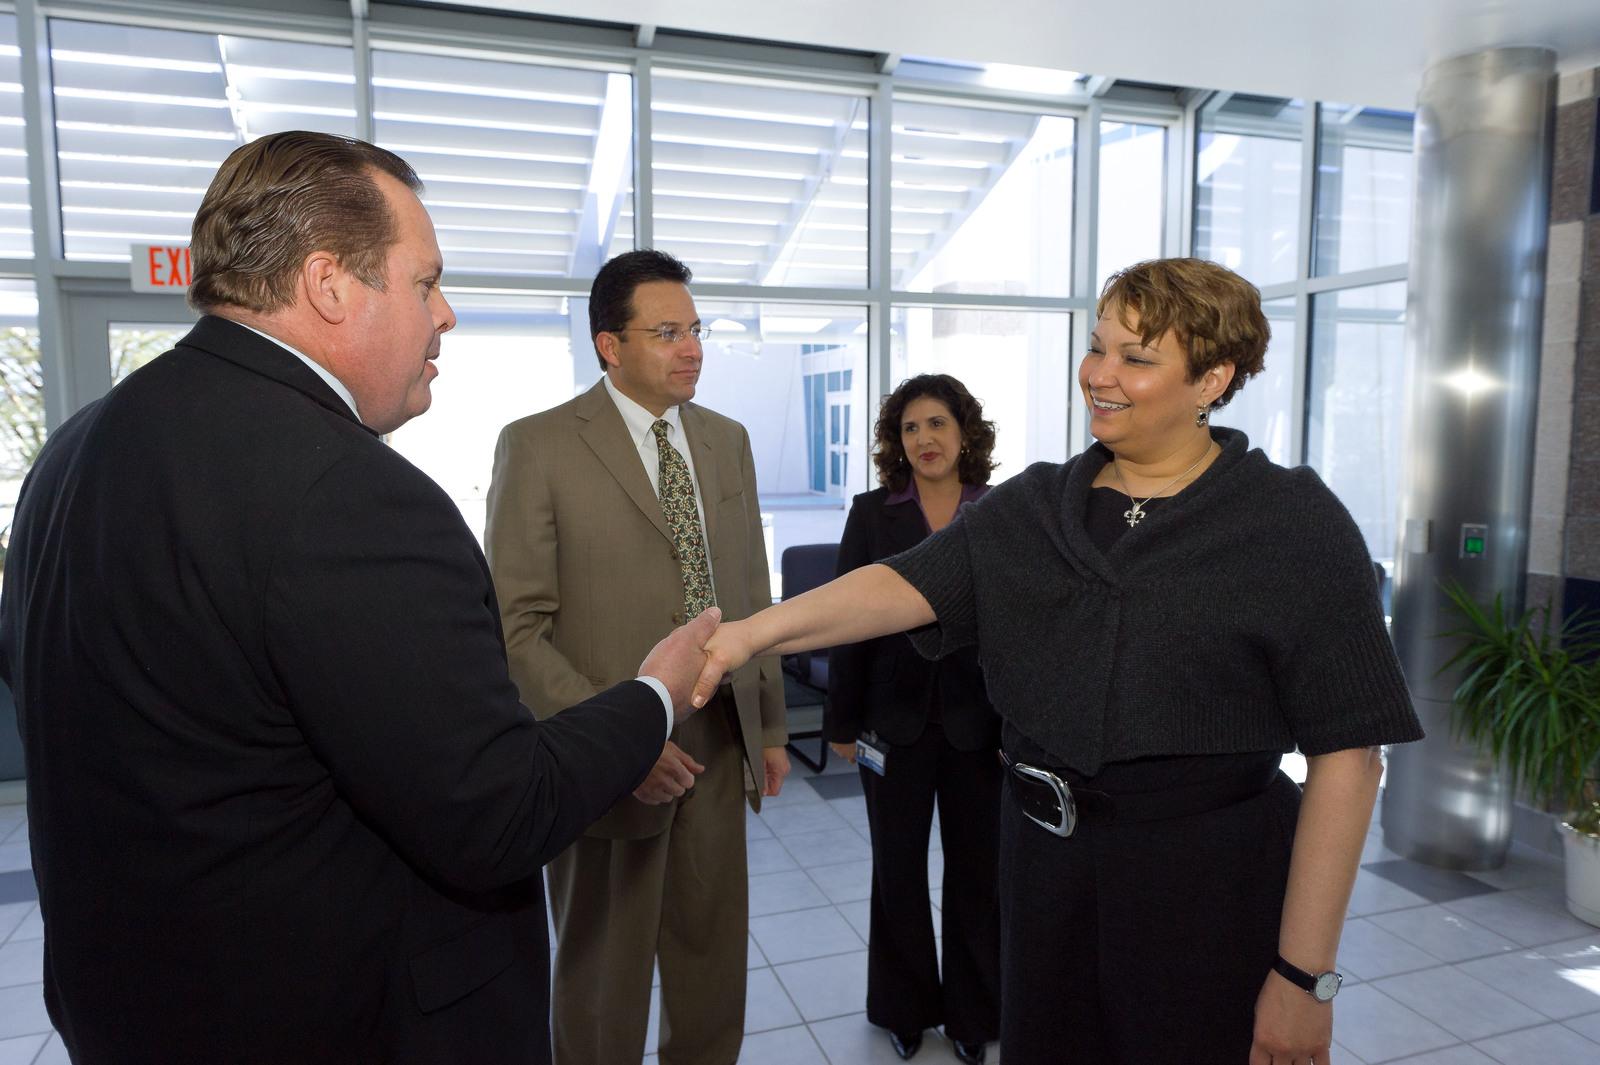 Office of the Administrator (Lisa P. Jackson) - El Paso [412-APD-649-2011-01-27_El_Paso_082.jpg]